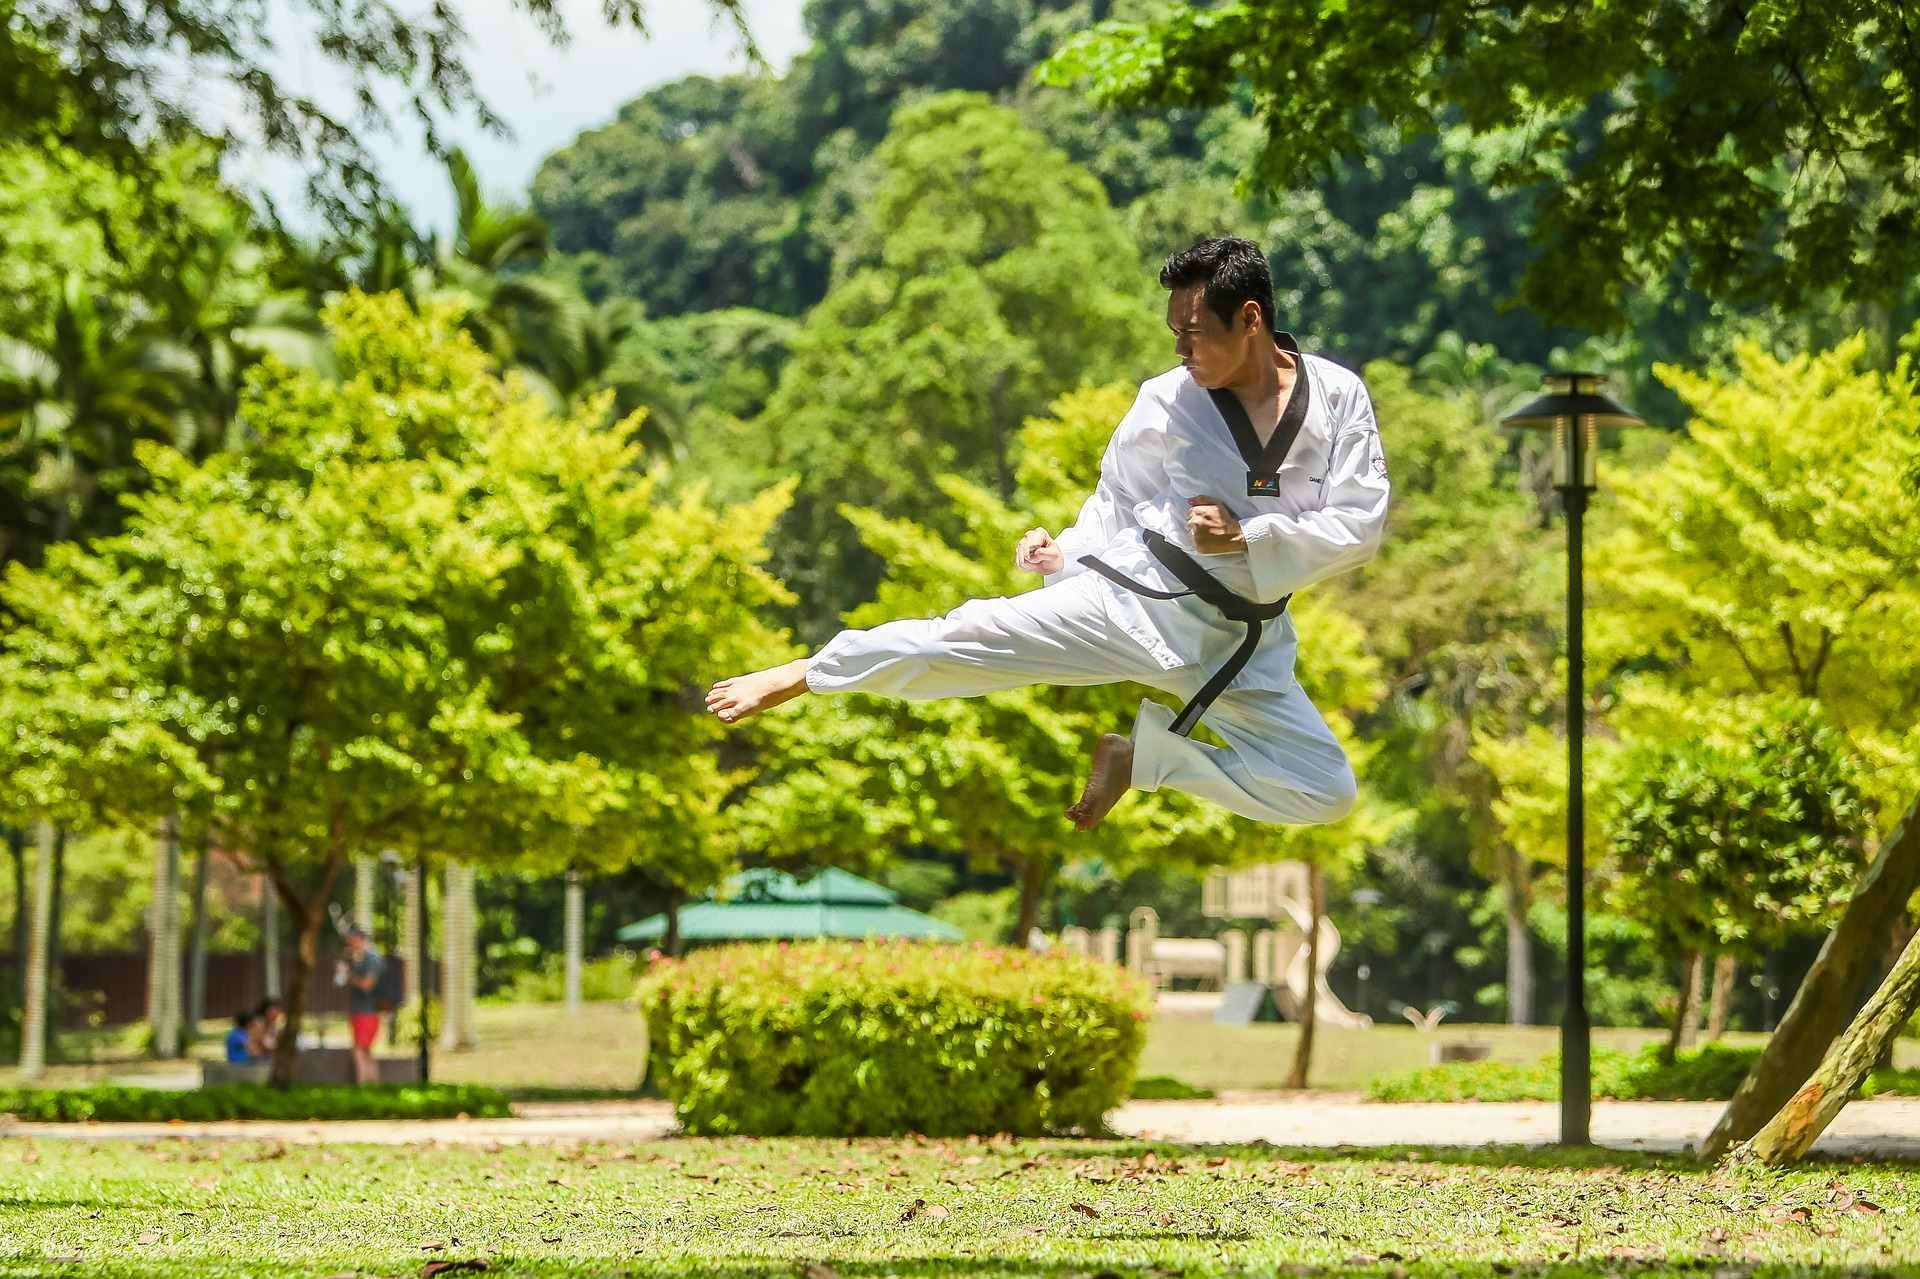 Chinois pratiquant le Kung-Fu